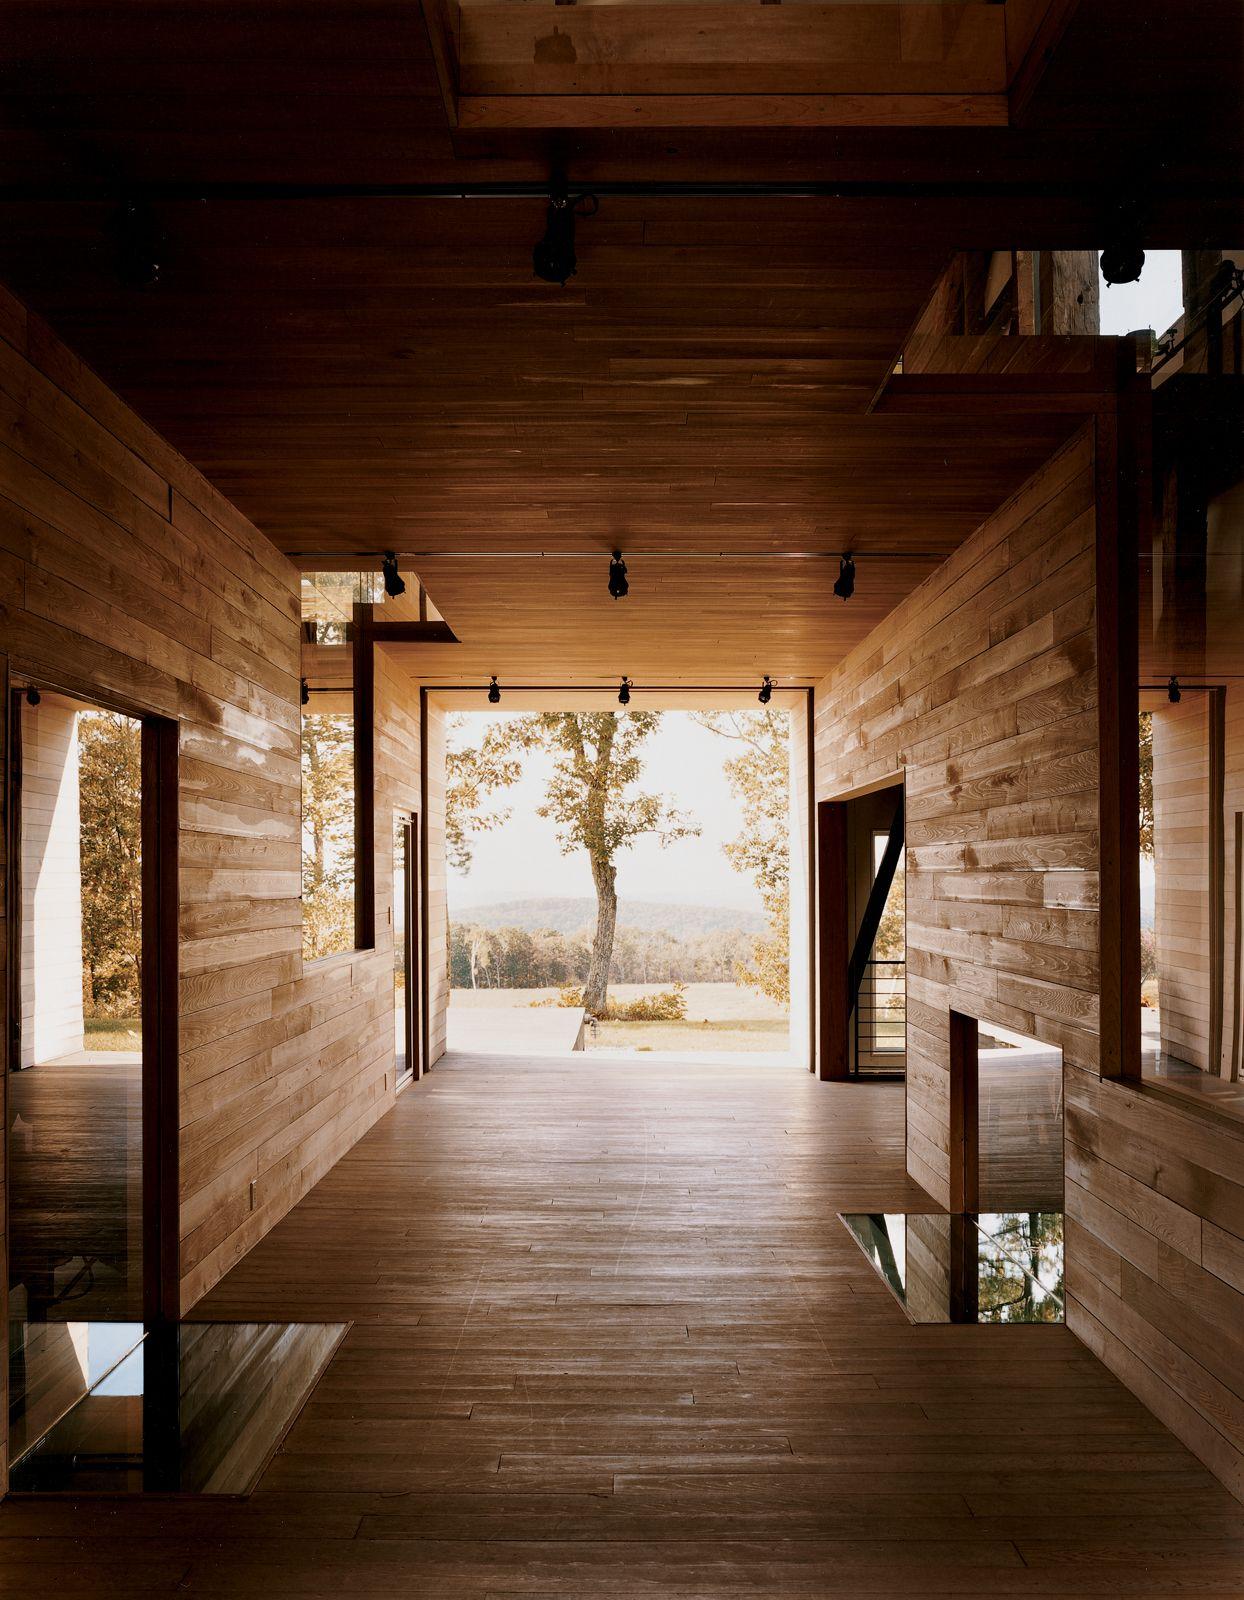 Pin By Jasmina Matko Kolsek On Architecture Inside N Out House Design Barn House Modern Barn